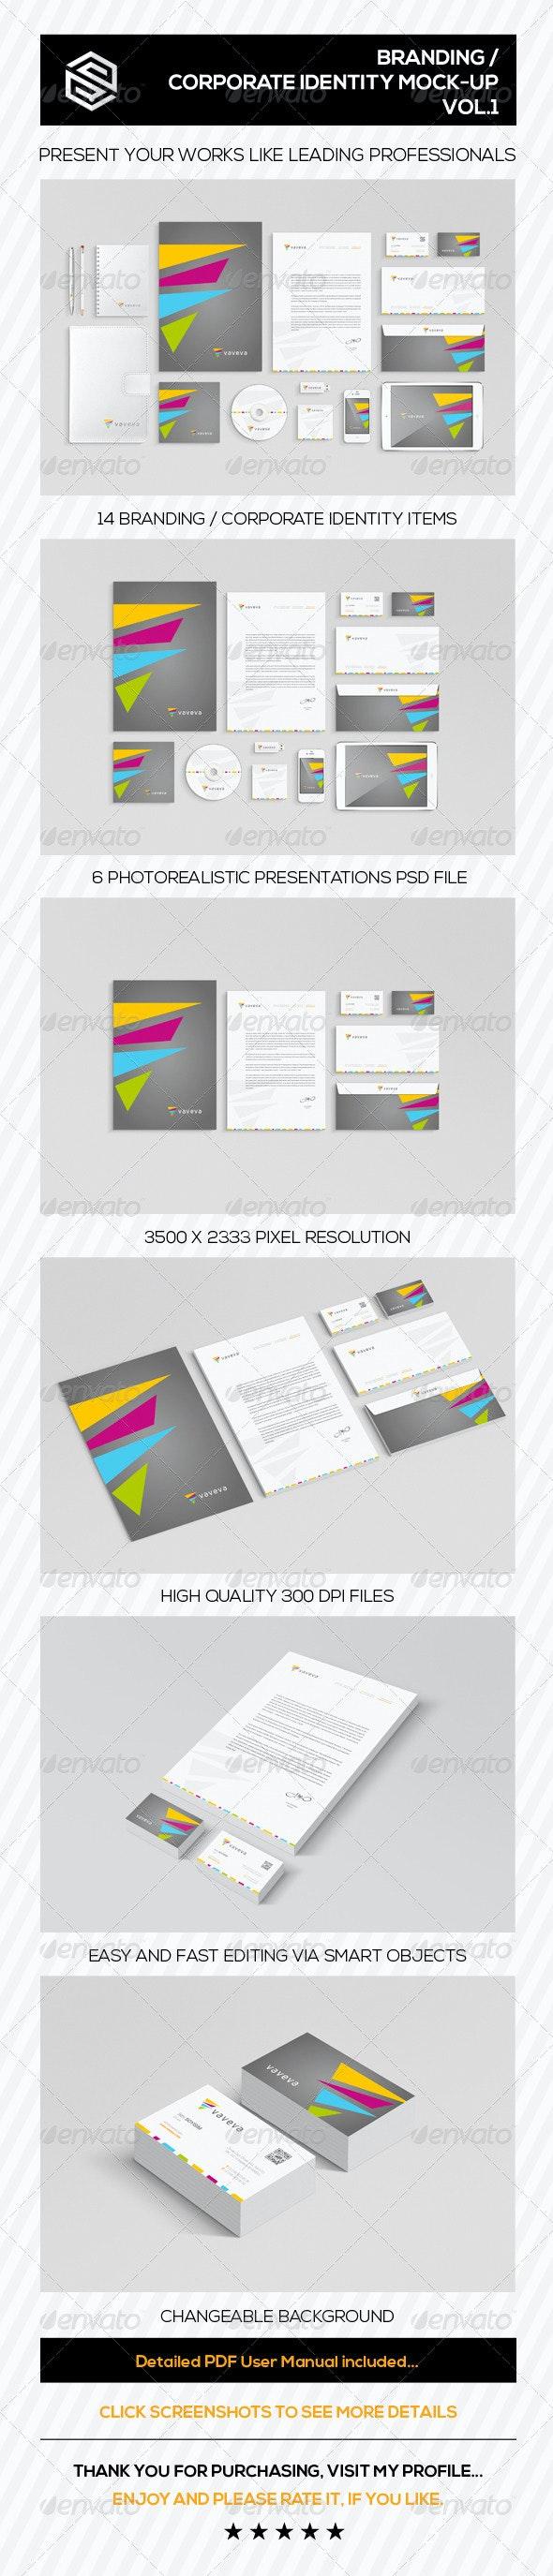 Branding / Corporate Identity Mock-Up Vol.I - Product Mock-Ups Graphics